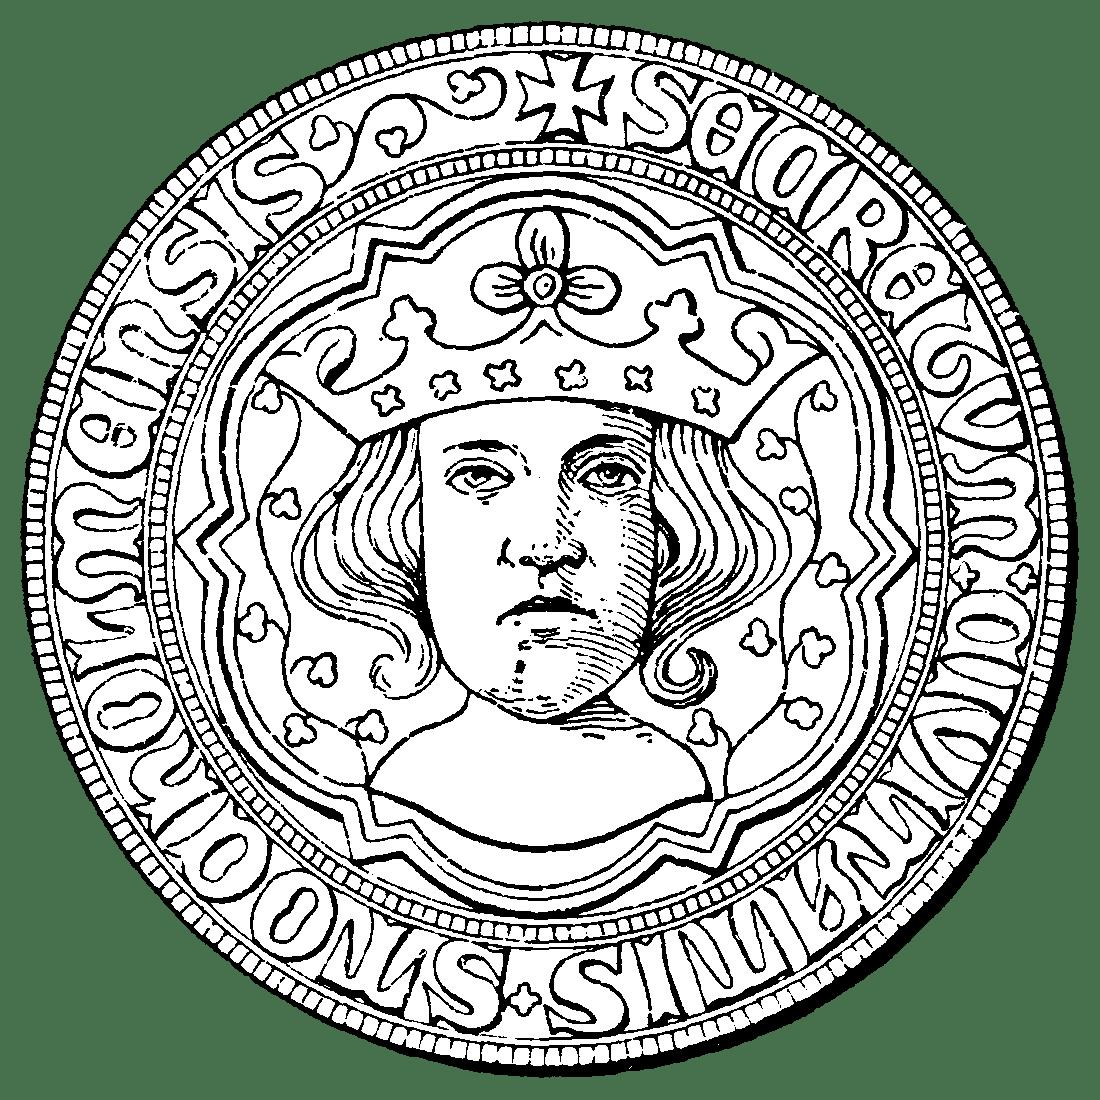 http://upload.wikimedia.org/wikipedia/commons/d/d2/Stockholms_stads_tredje_sigill.png